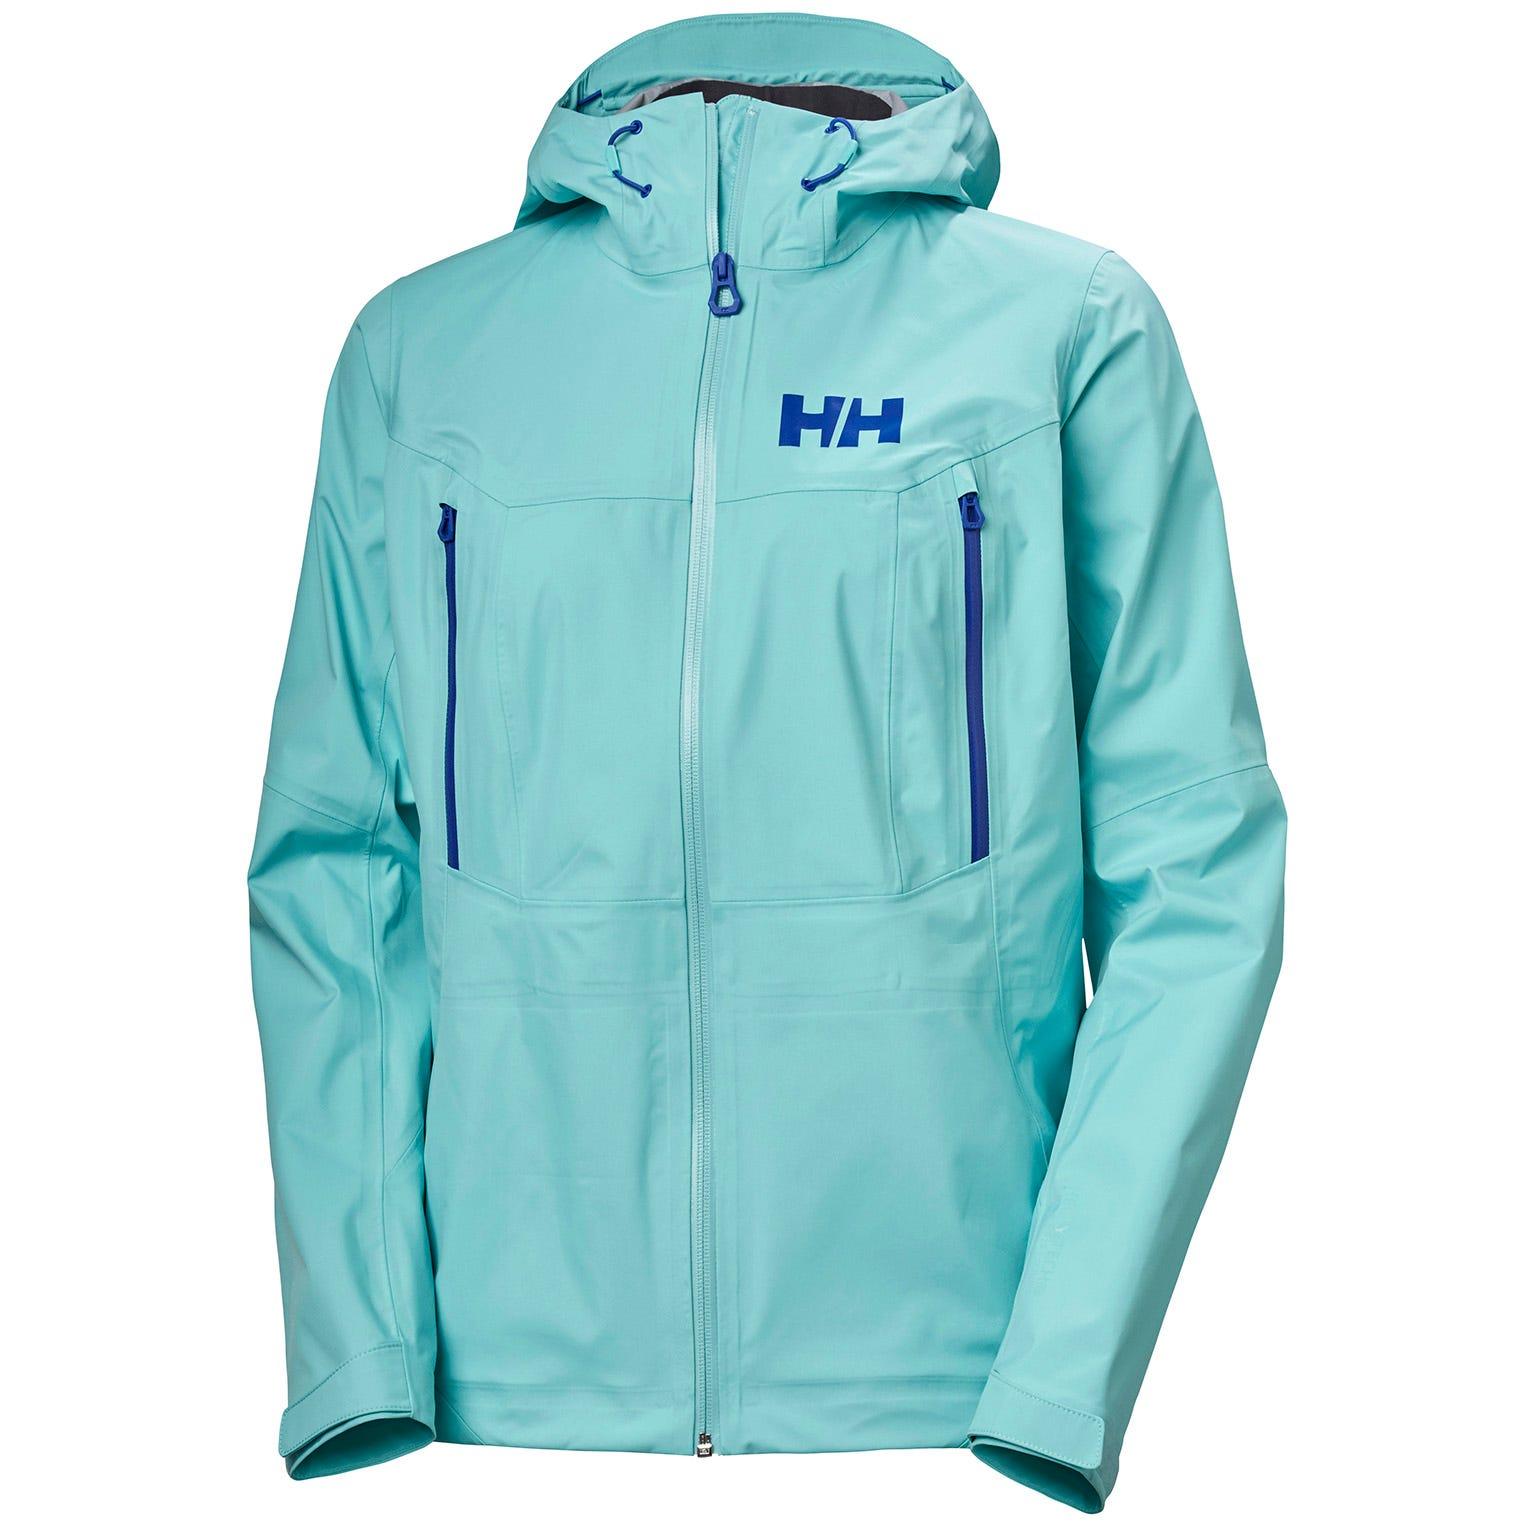 Helly Hansen Mens Roam 2.5 Layer Waterproof Jacket